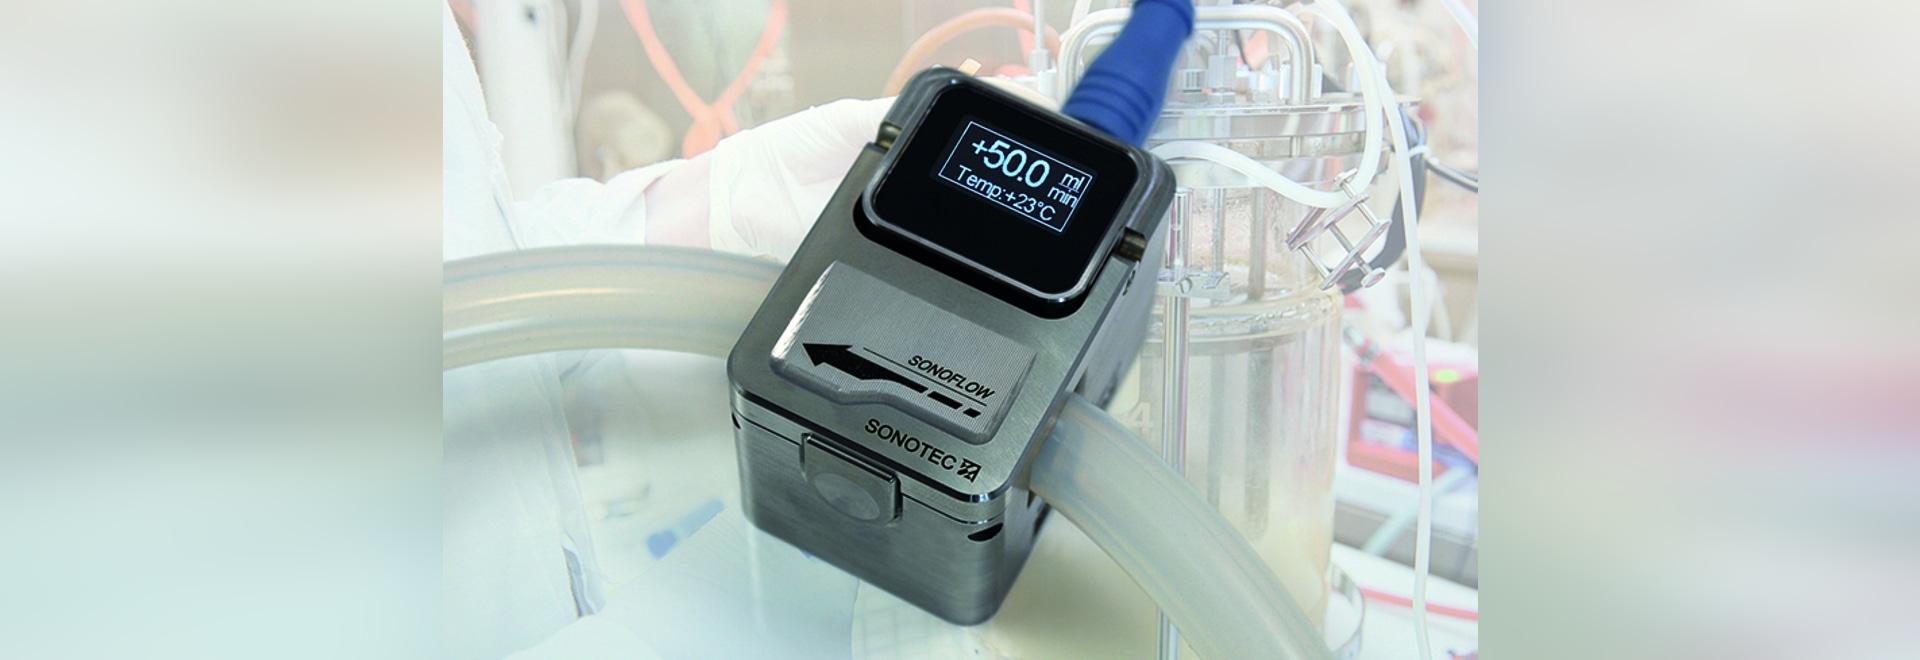 Ultrasonic Flow Sensor for Bioprocessing